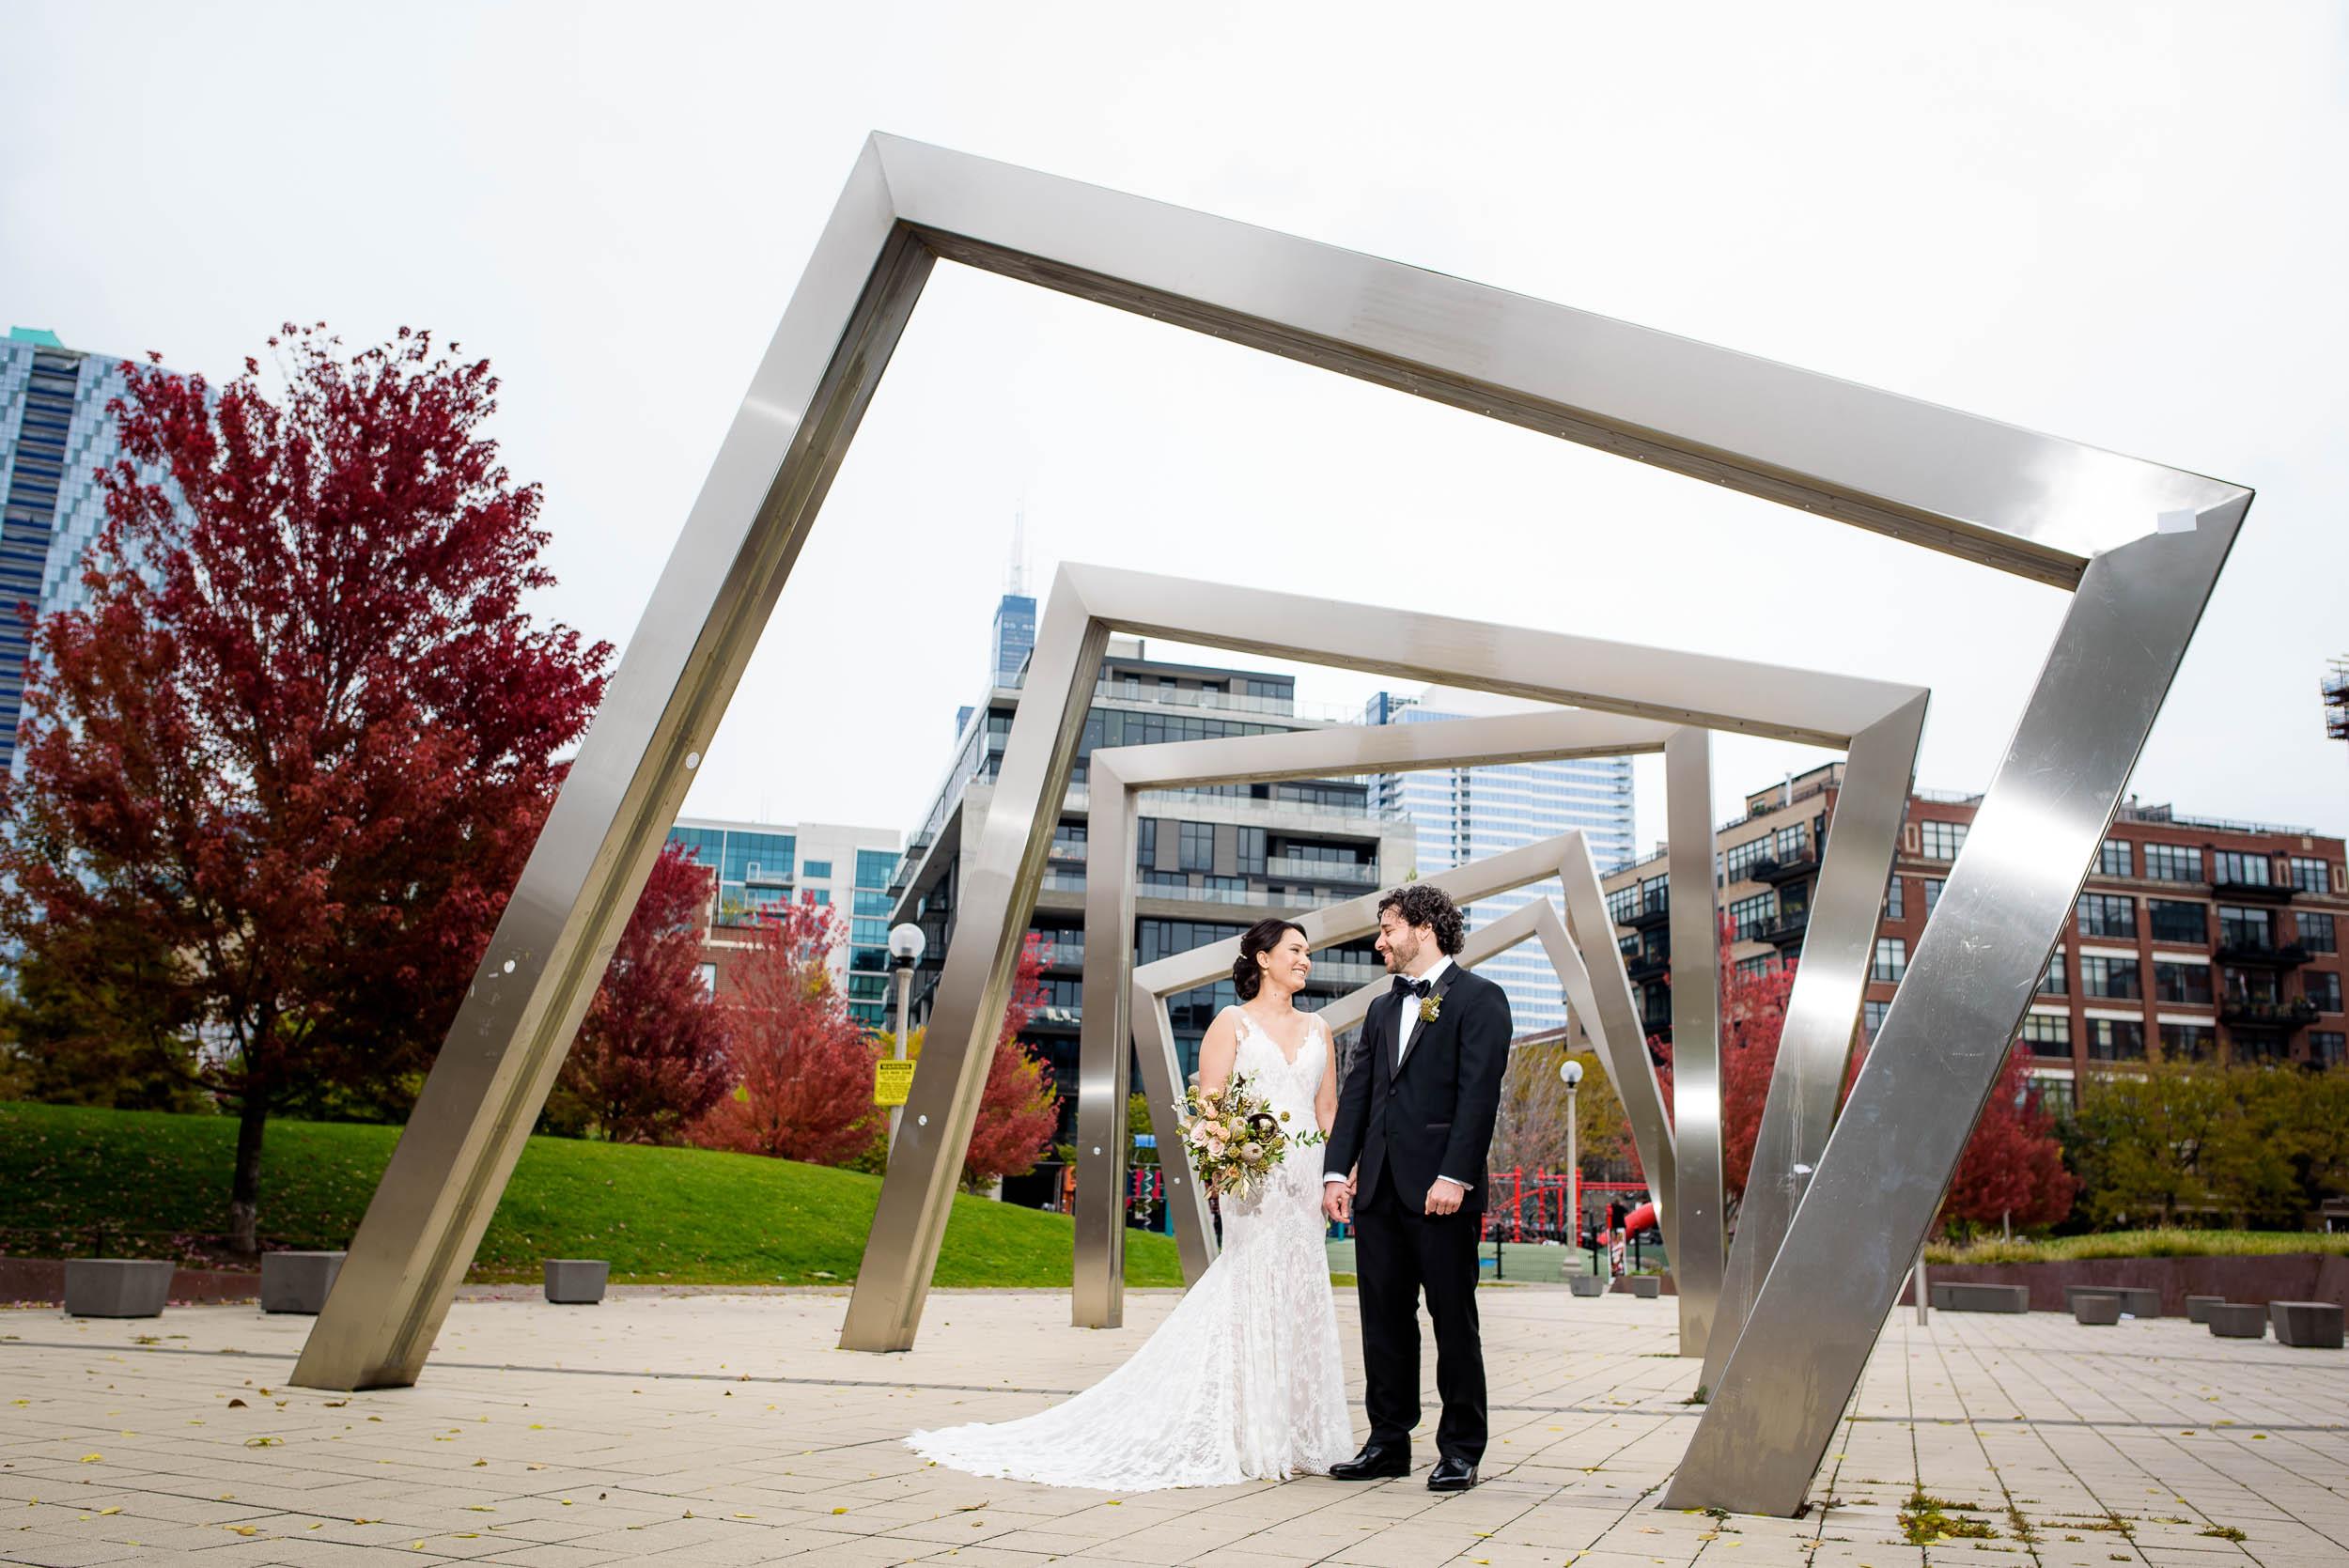 Creative fun wedding photo at Mary Bartelme Park Chicago.